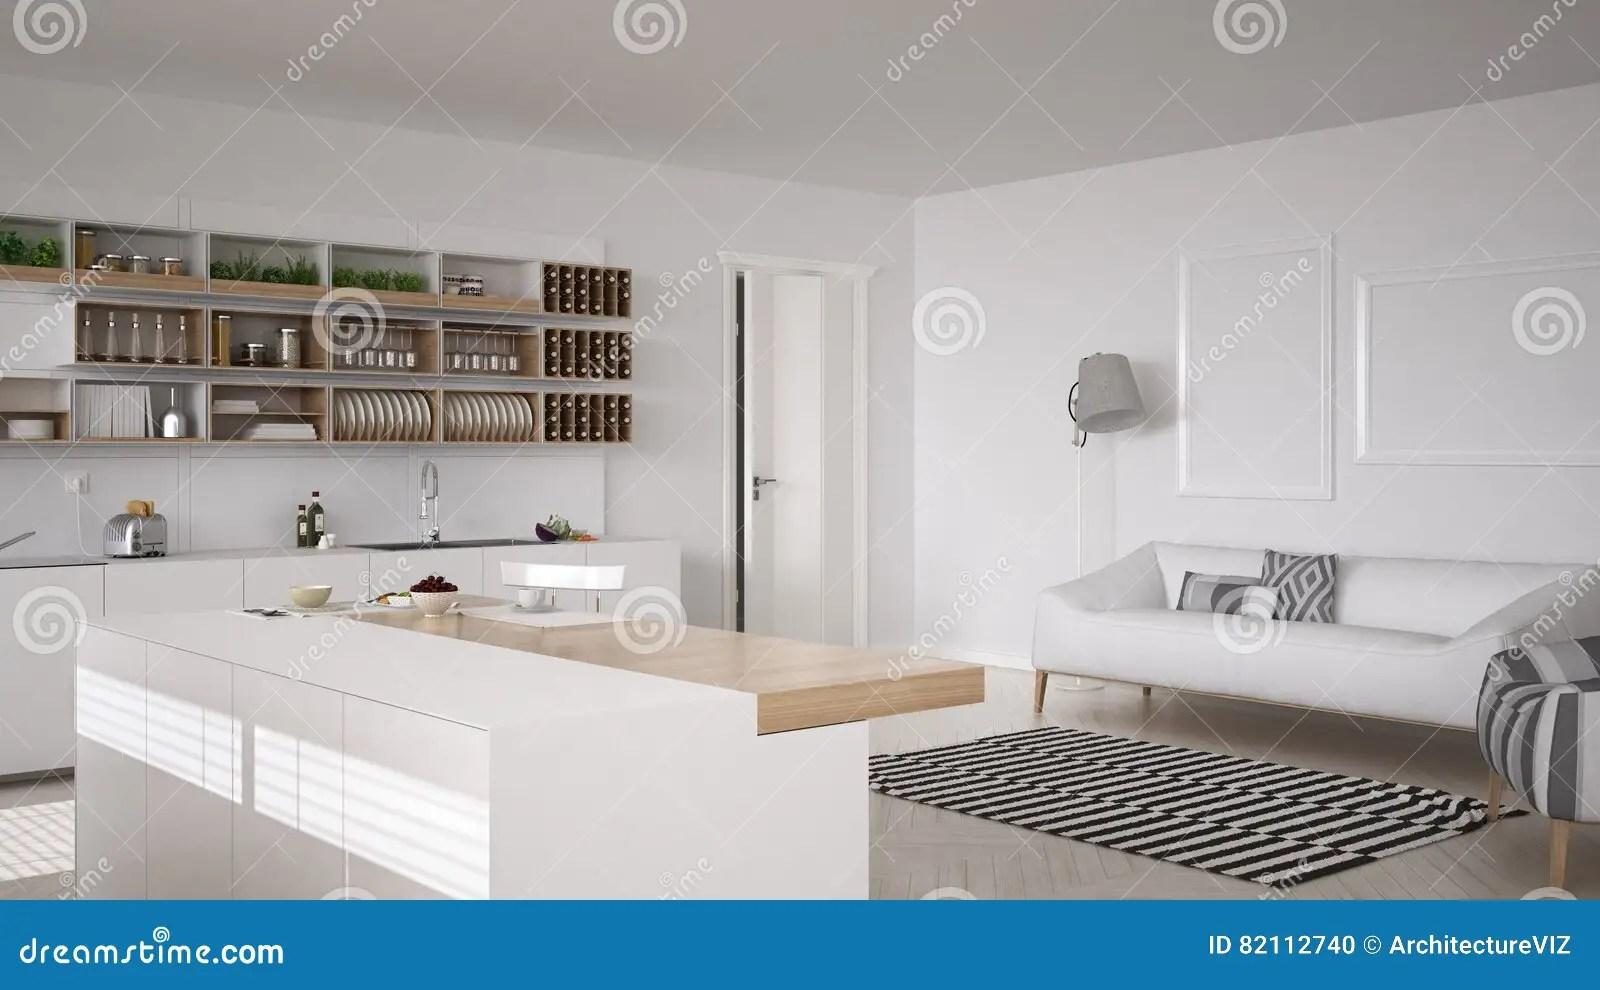 framed prints for kitchens ceramic tile kitchen countertops 斯堪的纳维亚白色厨房 minimalistic室内设计库存照片 图片包括有干净 minimalistic室内设计